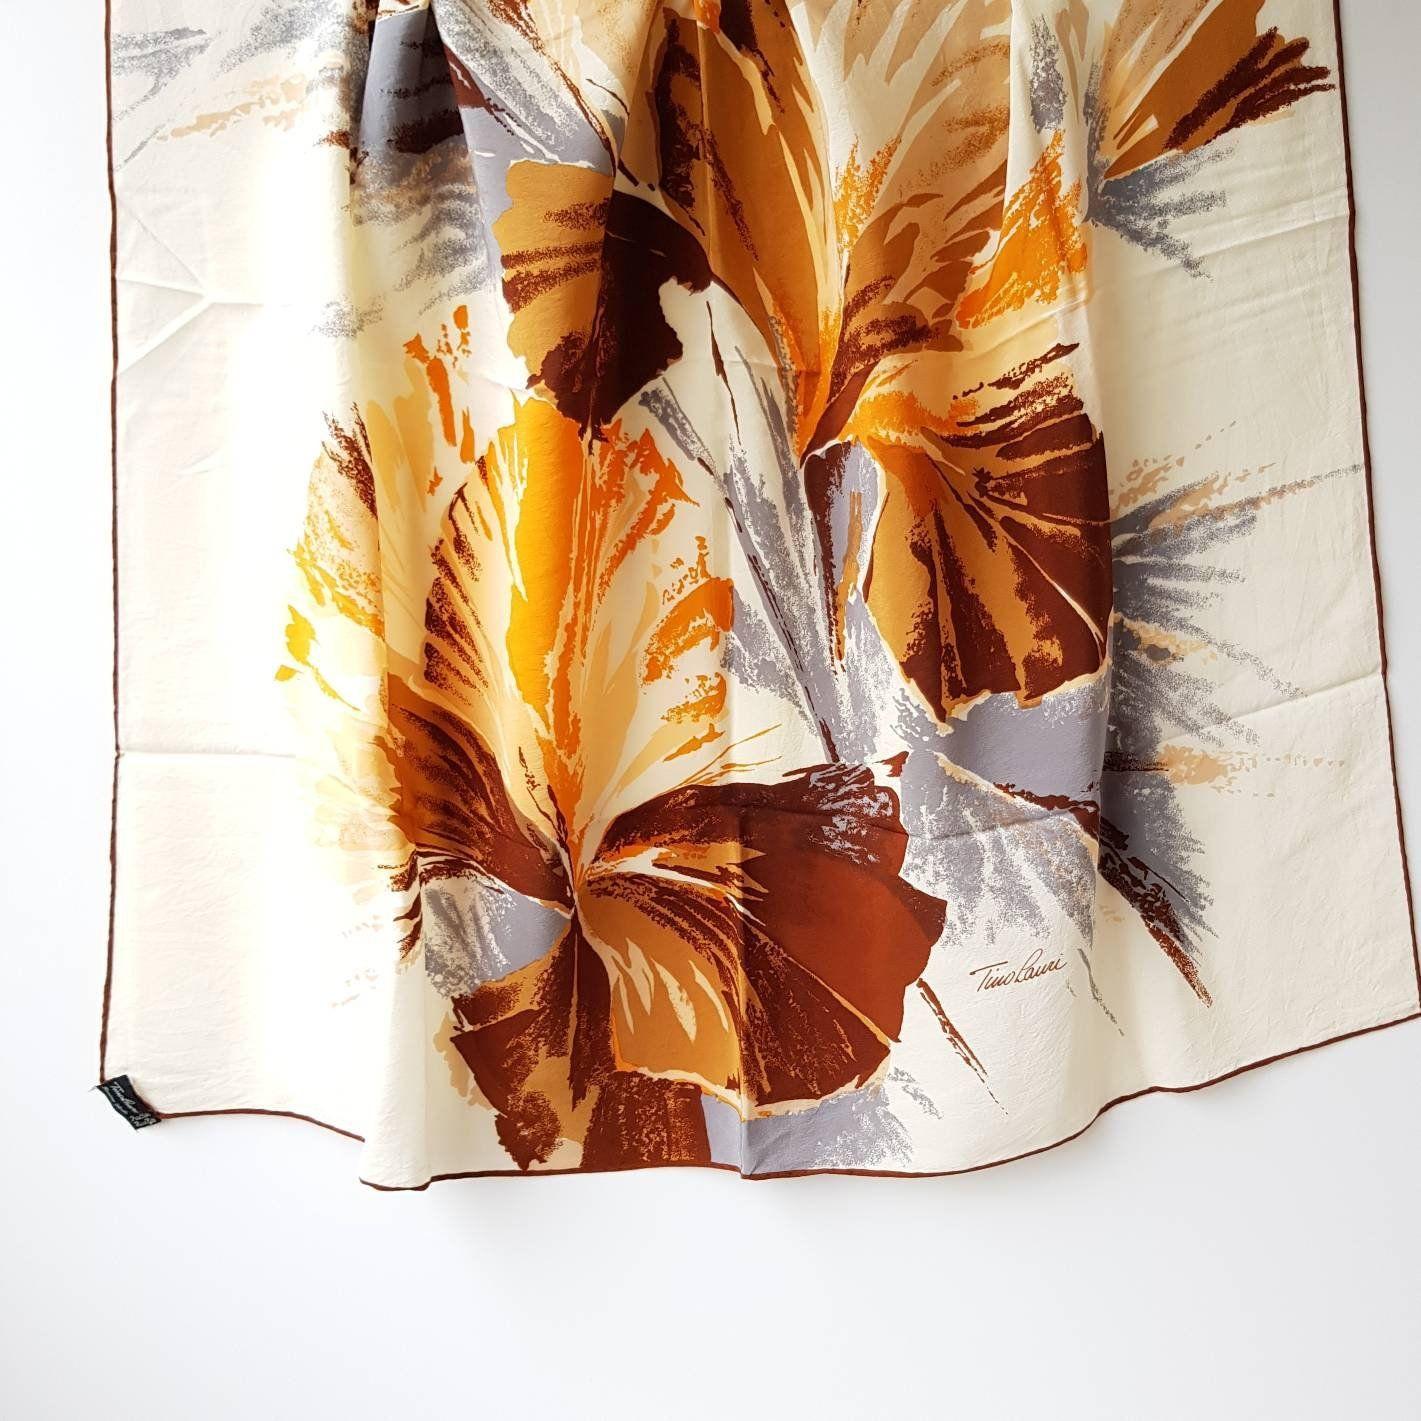 Elegant Scarves For Women Large Square Silk Scarves Ladies Neck Scarf Luxury Vintage Silk Bandana For Hair Burnt Orange Styles 35 X 35 Elegant Scarves Square Silk Scarf Womens Neck Scarf